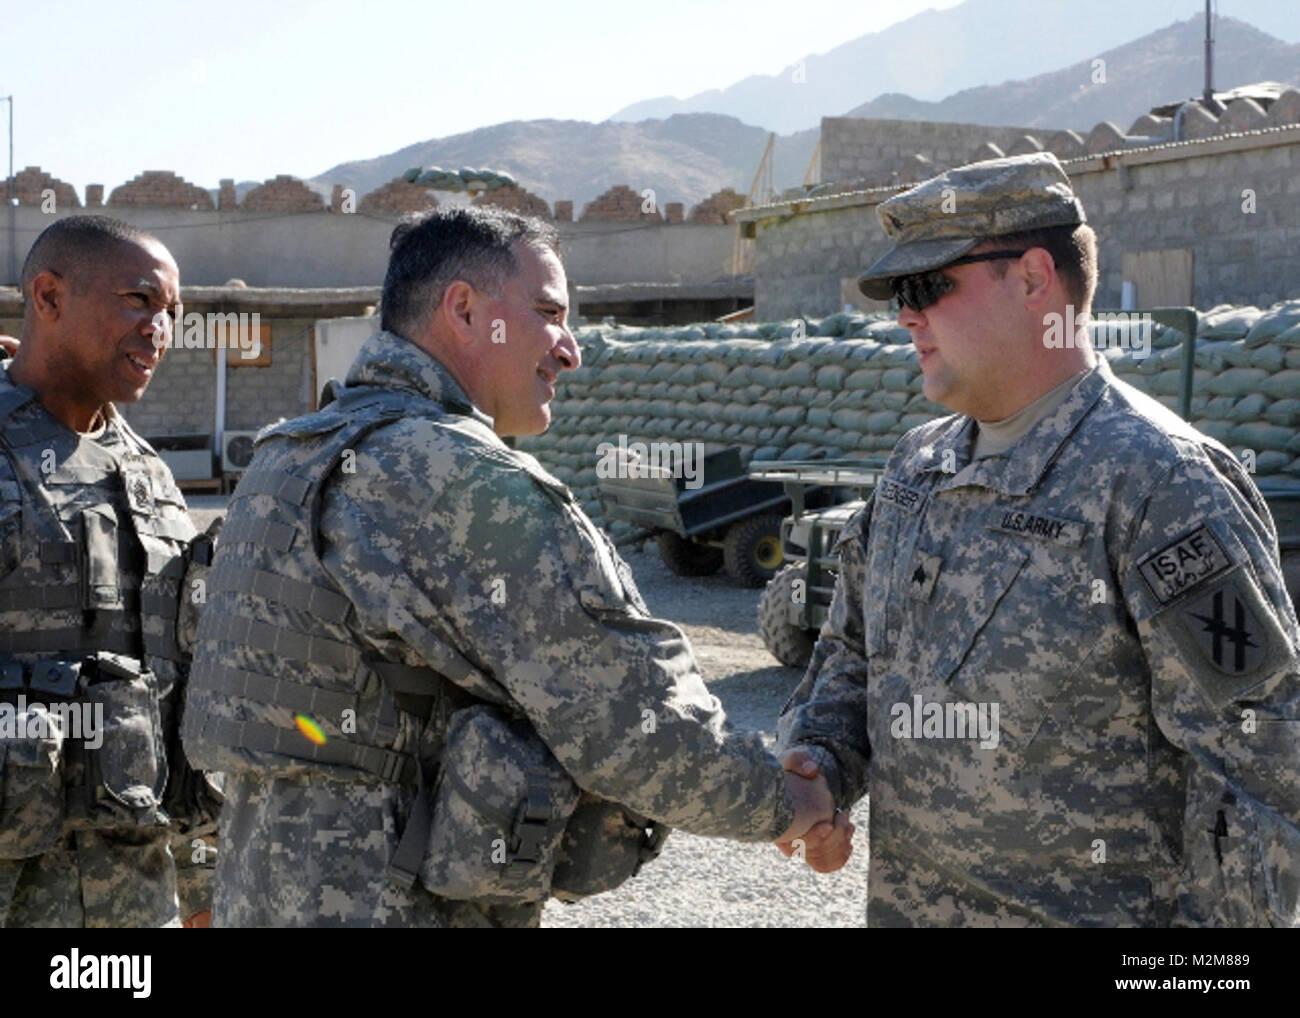 091224-A-3421S-097: NANGARHAR PROVINCE, Afghanistan (Dec. 24, 2009) – U.S. Army Sgt. Adam W. Pledger, Troop A, 1st - Stock Image